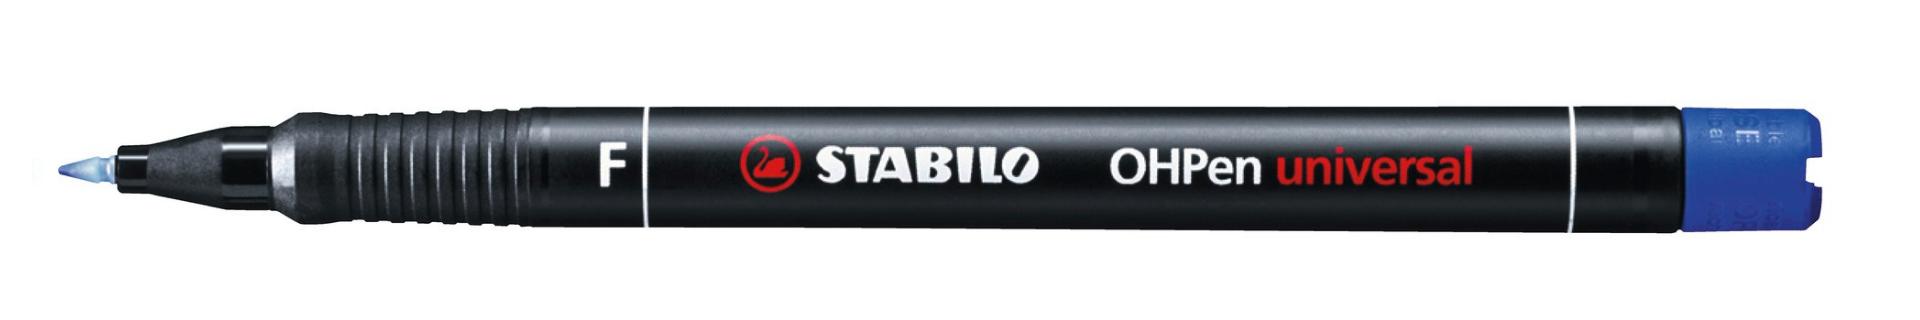 Stabilo OH Pen Universal